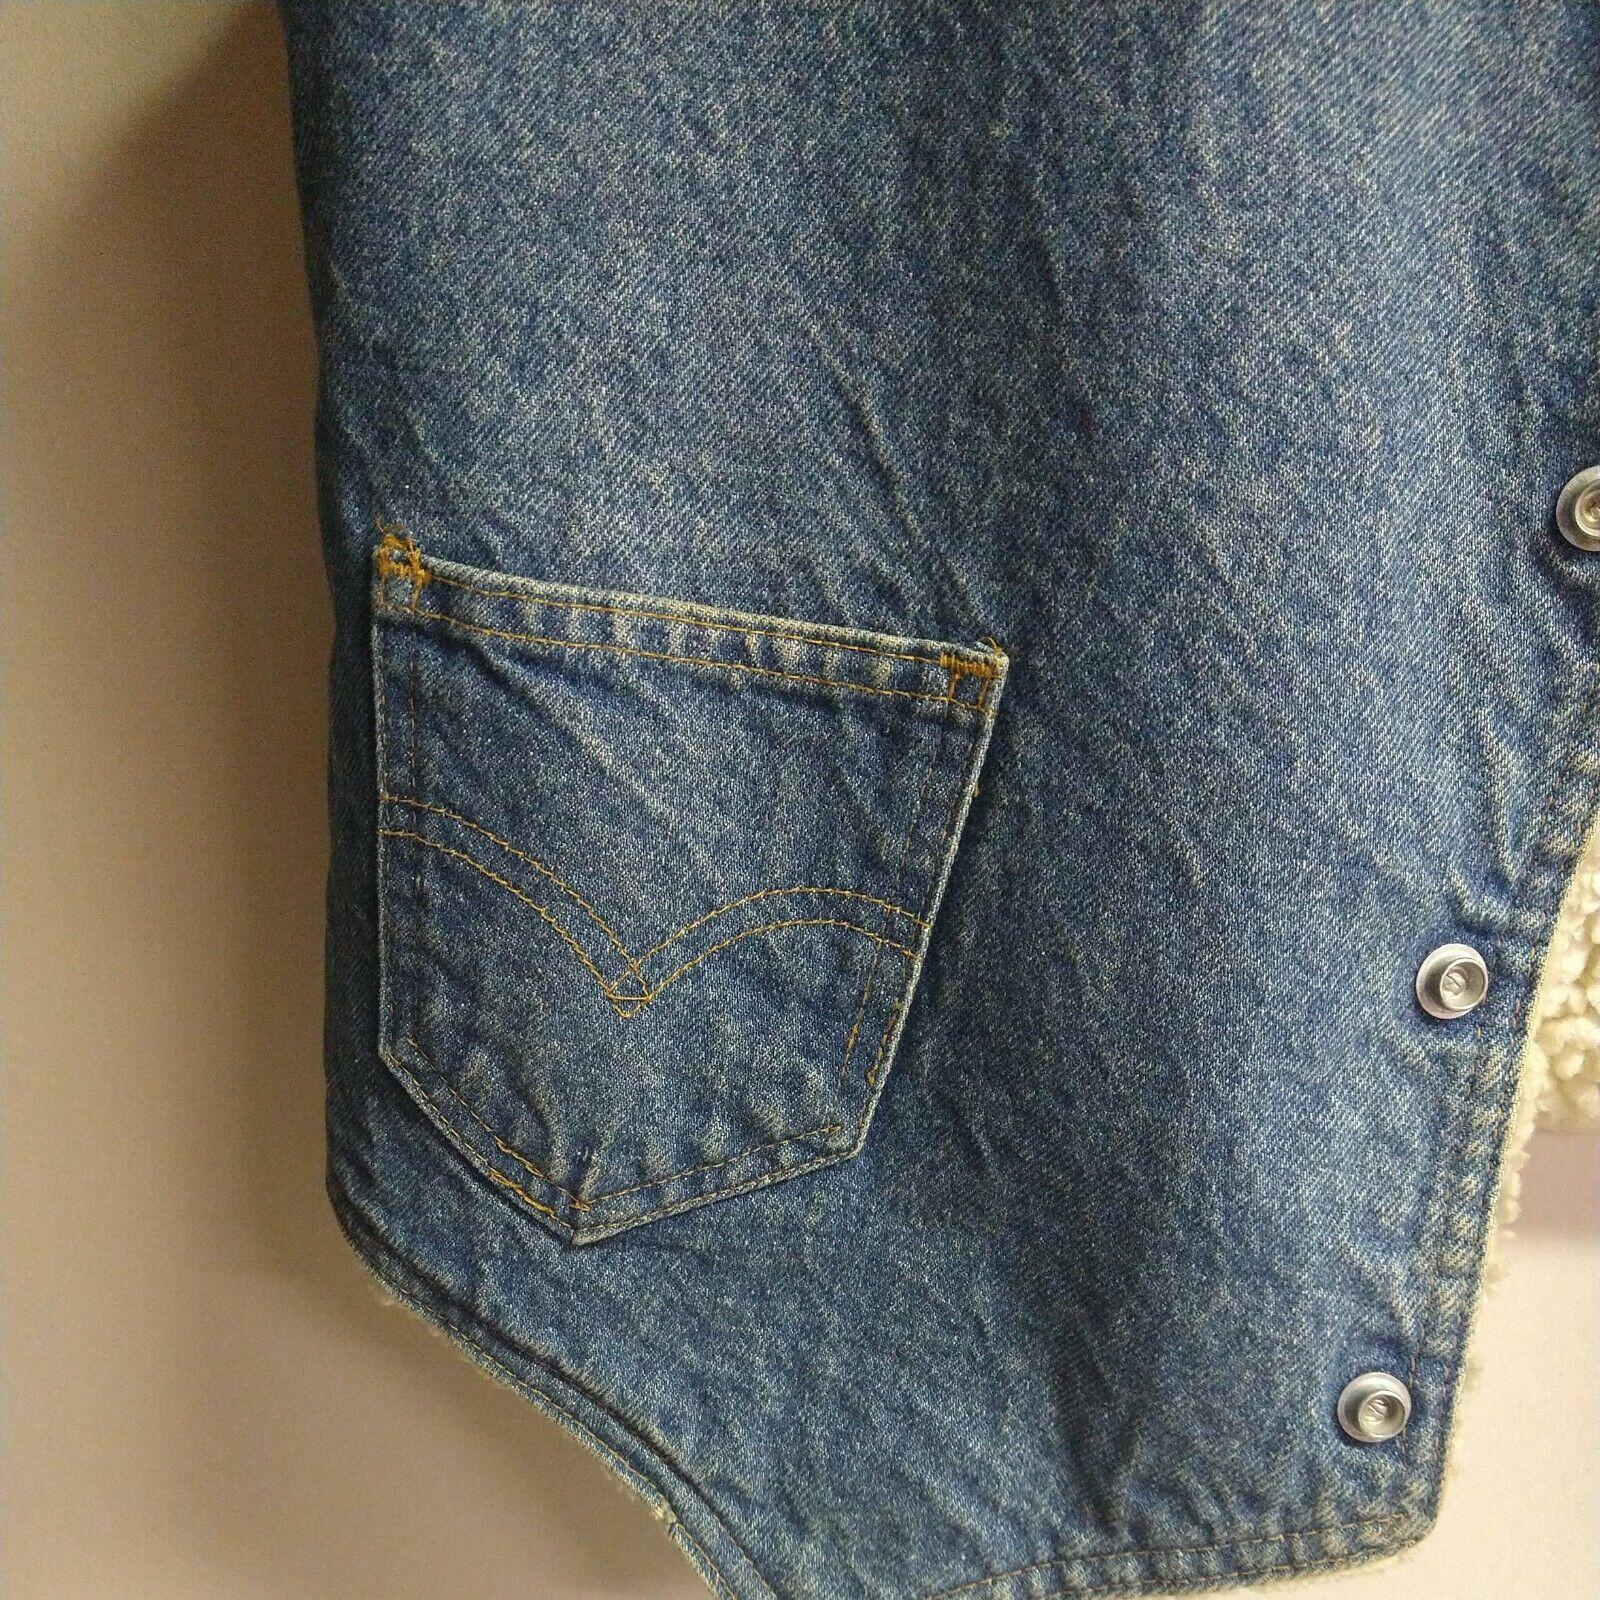 Levis vintage clothing Vest made in USA - image 3